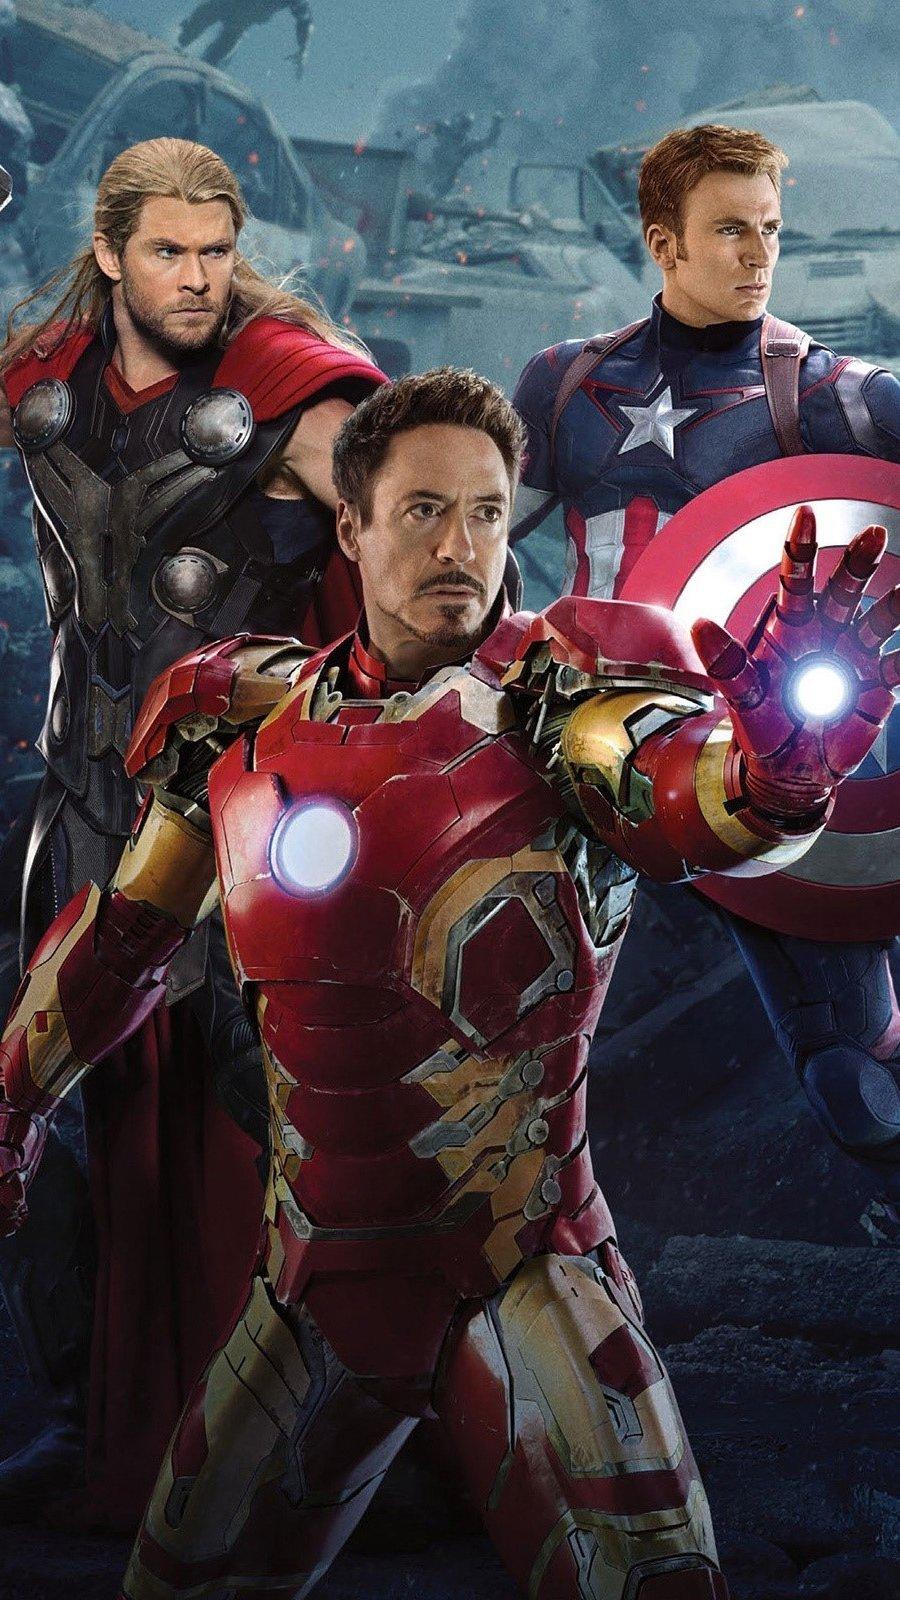 Fondos de pantalla Avengers 2 Vertical